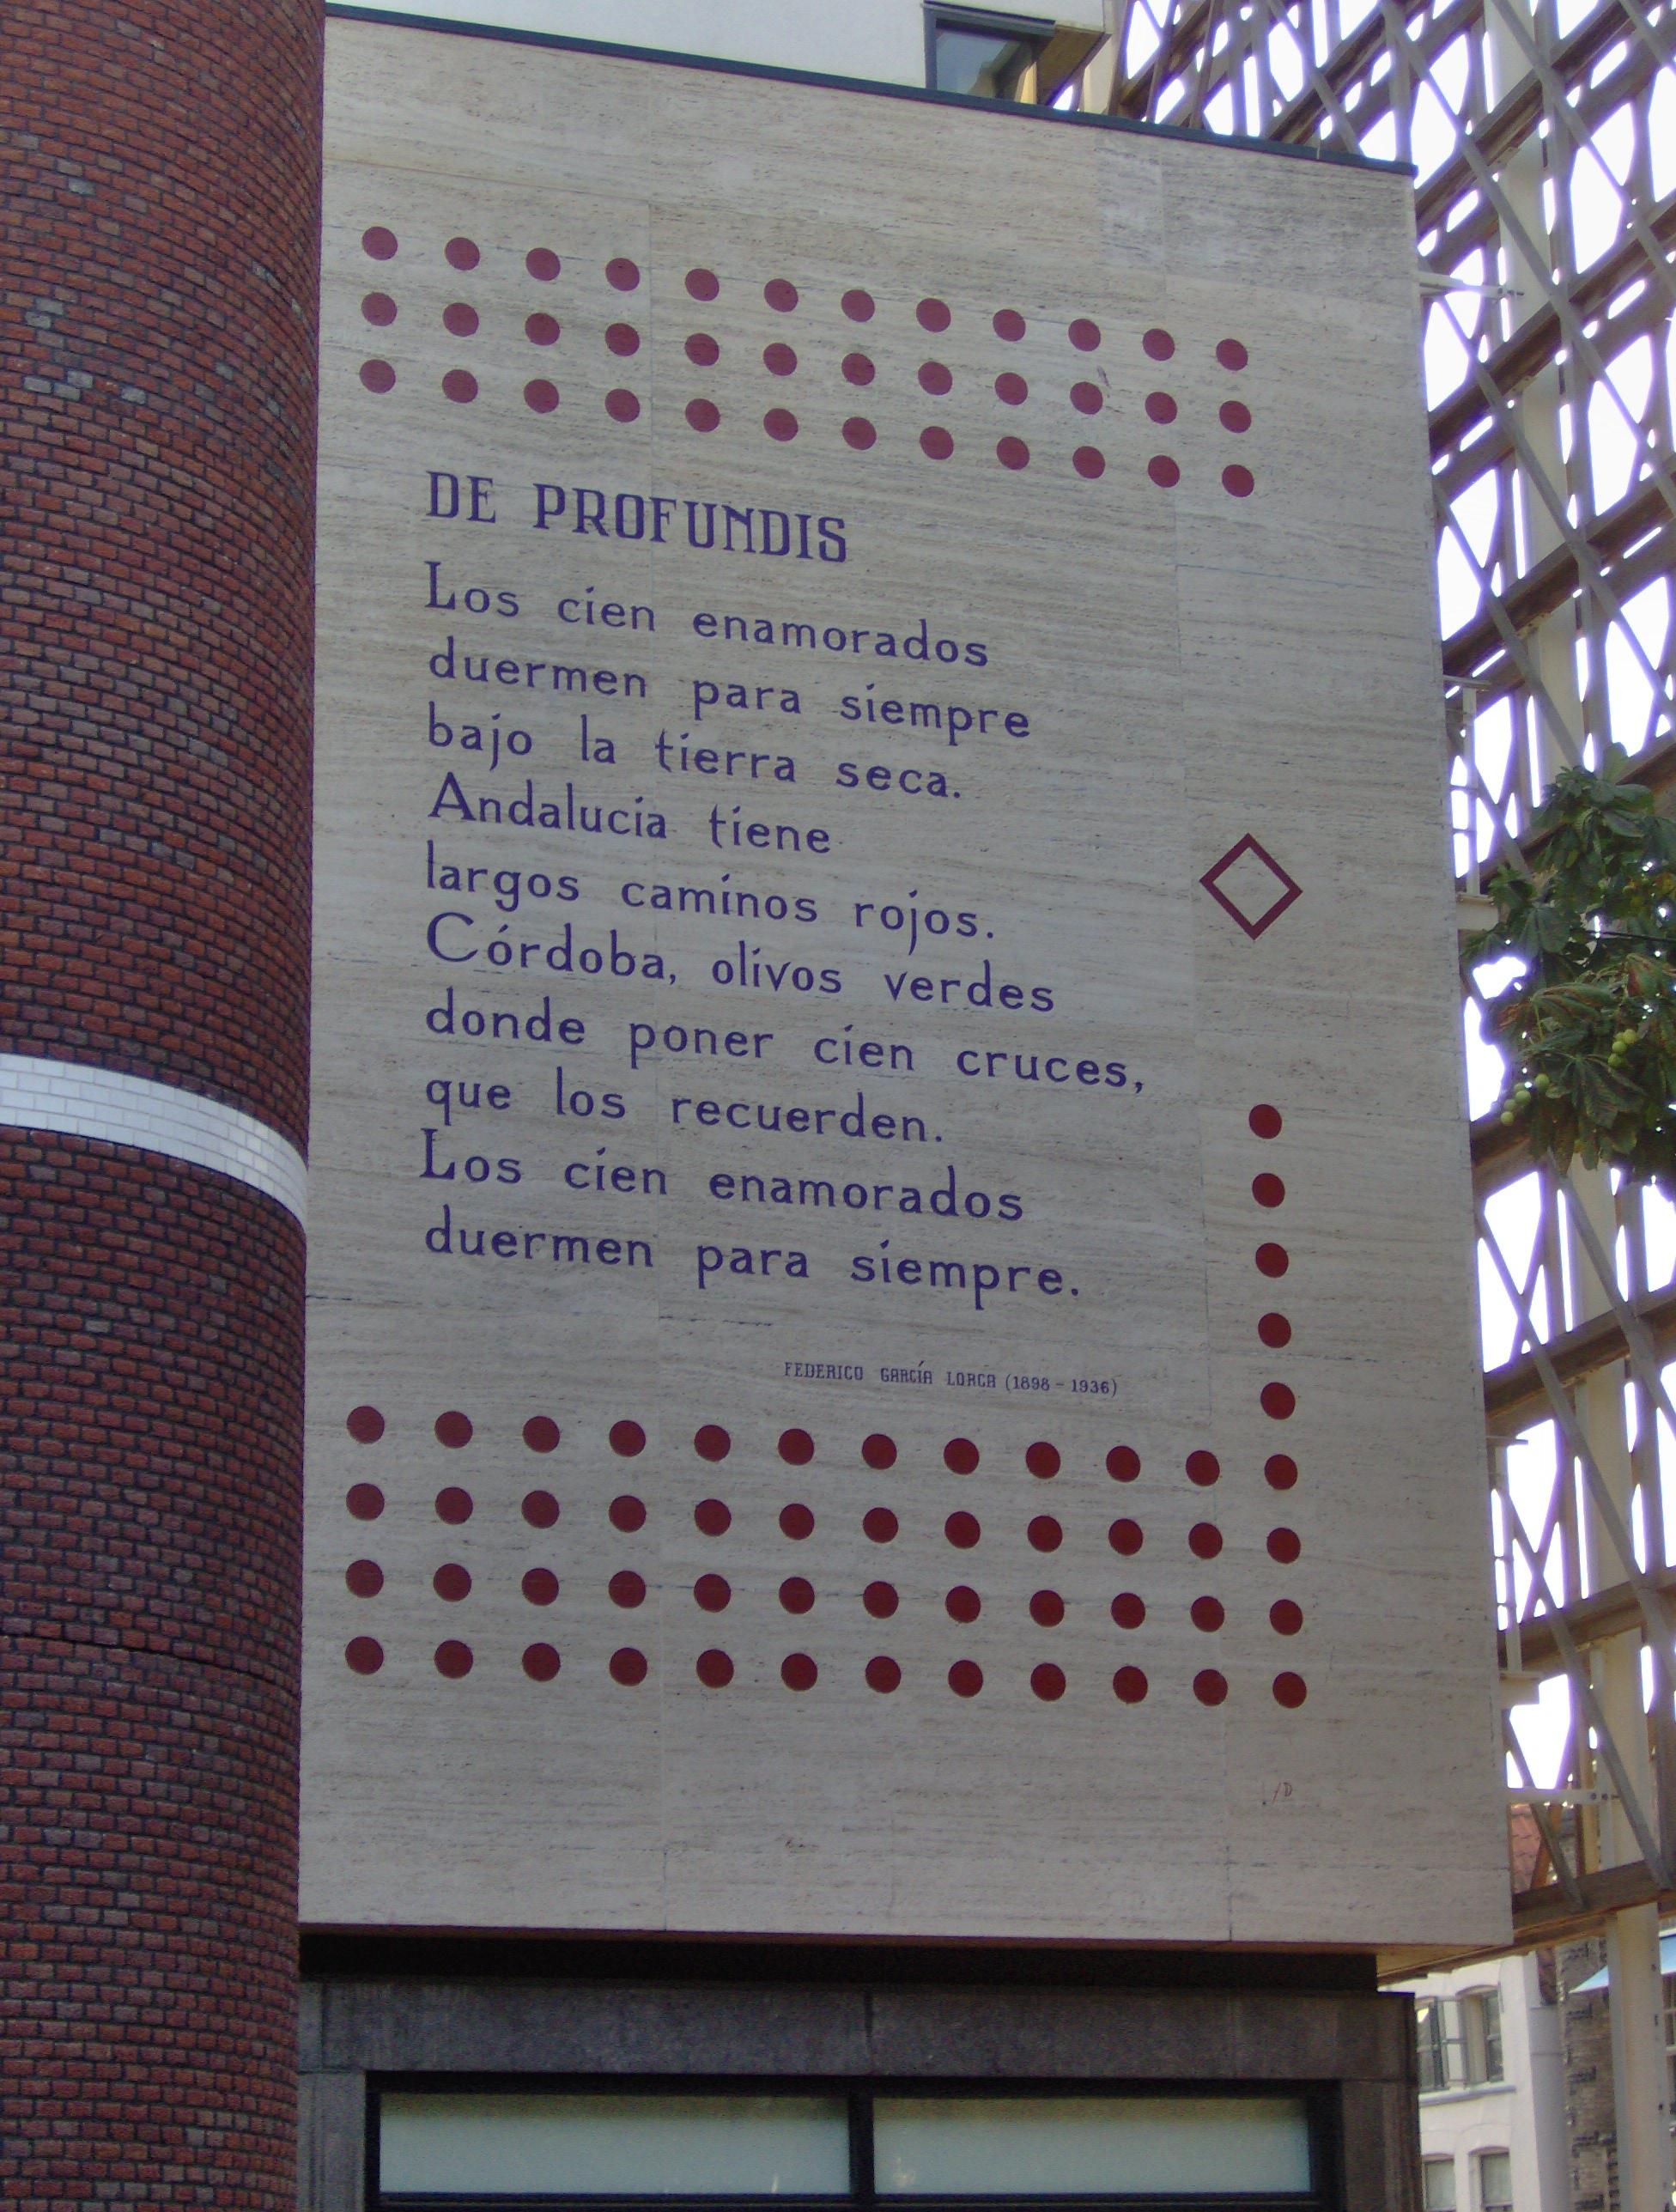 Federico Garcia Lorca Poèmes En Français : federico, garcia, lorca, poèmes, français, File:Federico, Garcia, Lorca, Profundis, Langebrug,, Leiden.JPG, Wikimedia, Commons